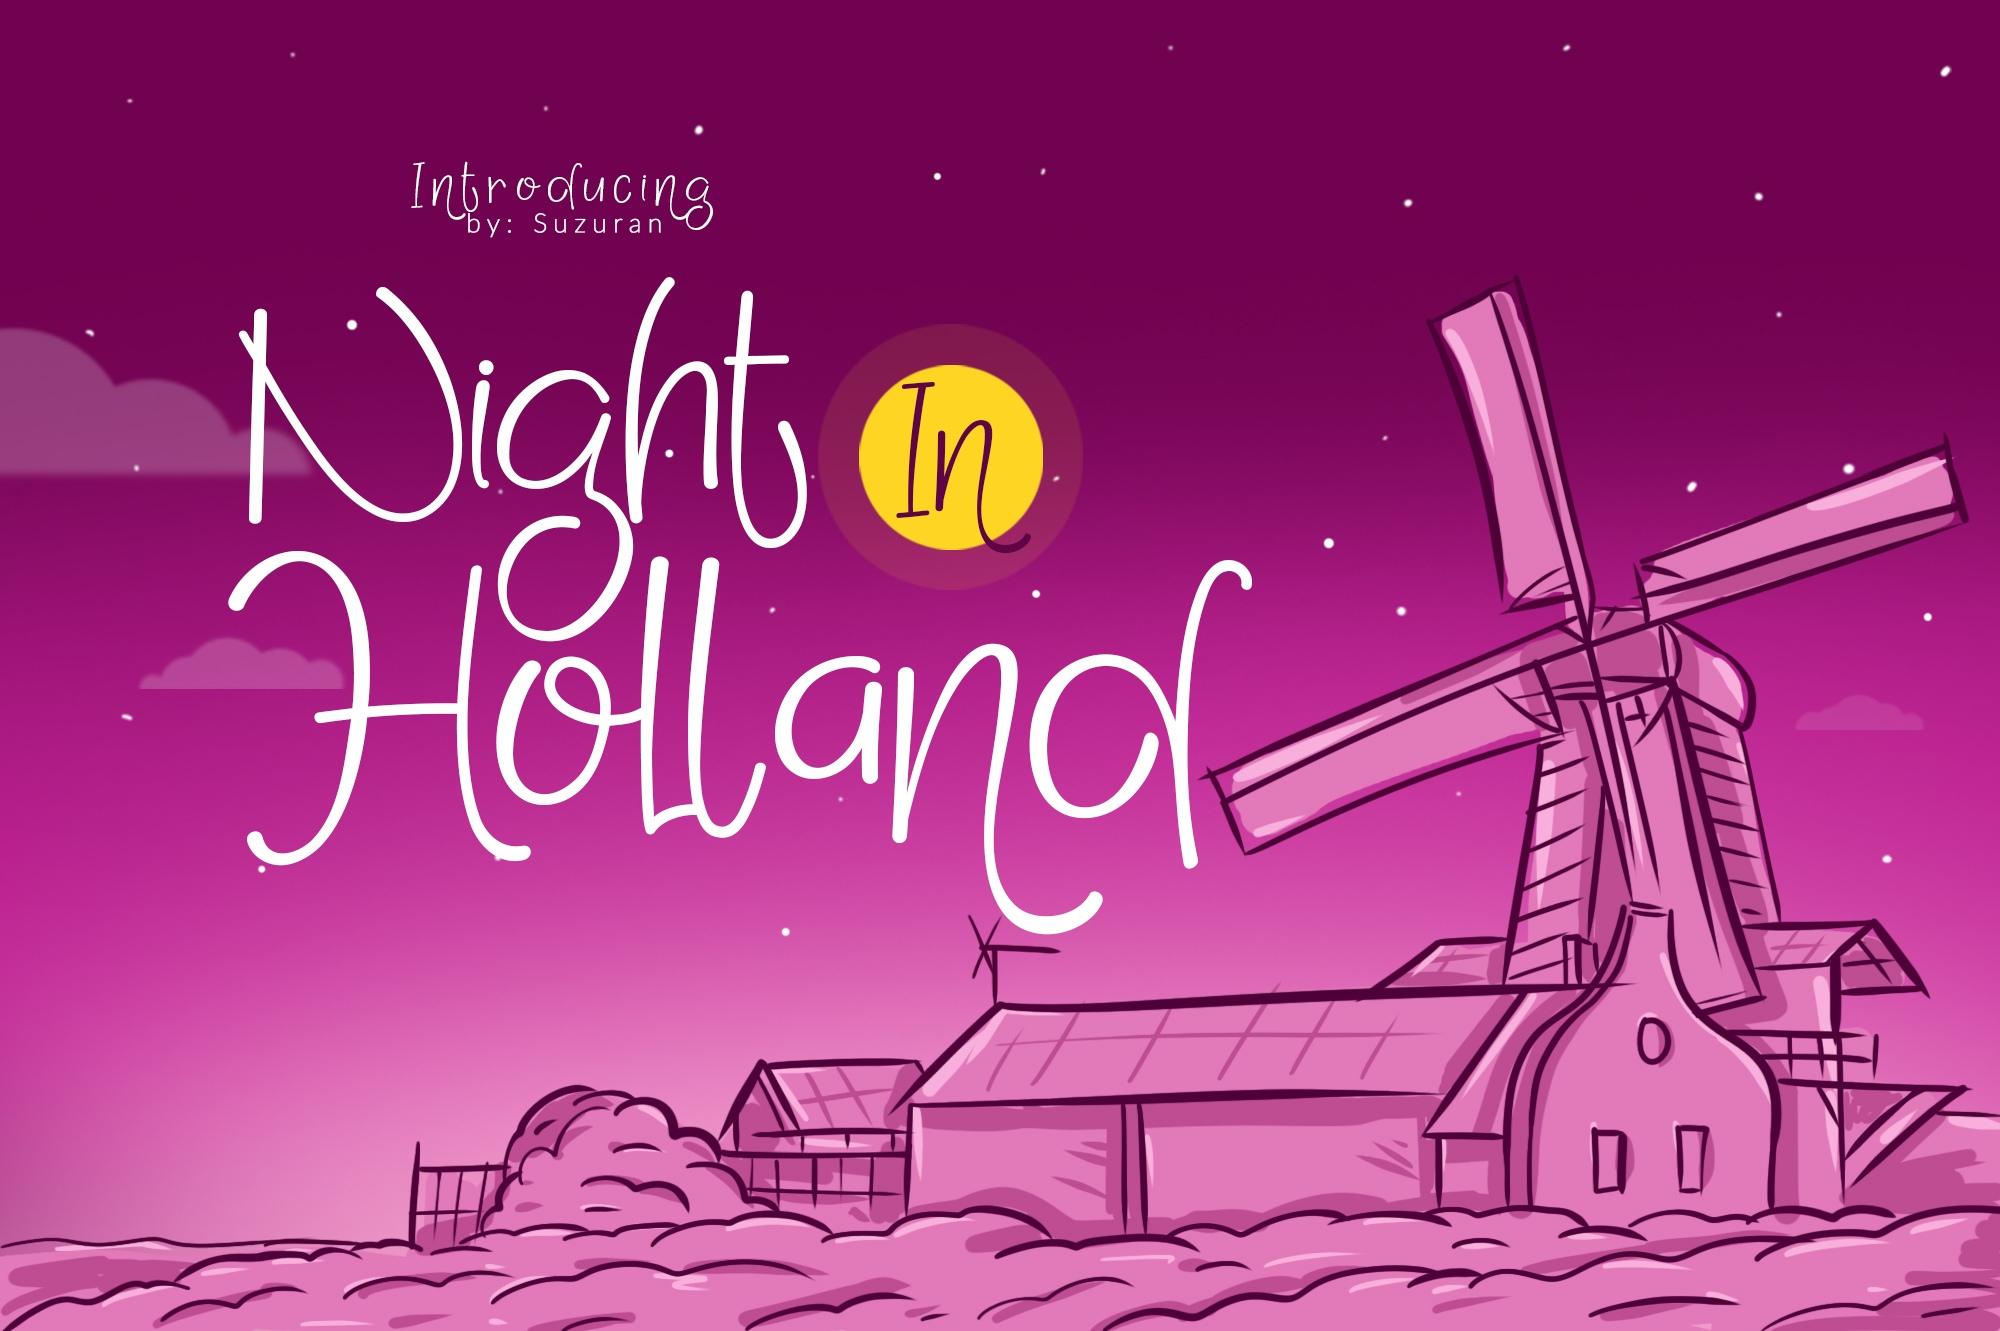 NightinHolland手绘海报可爱俏皮英文字体下载